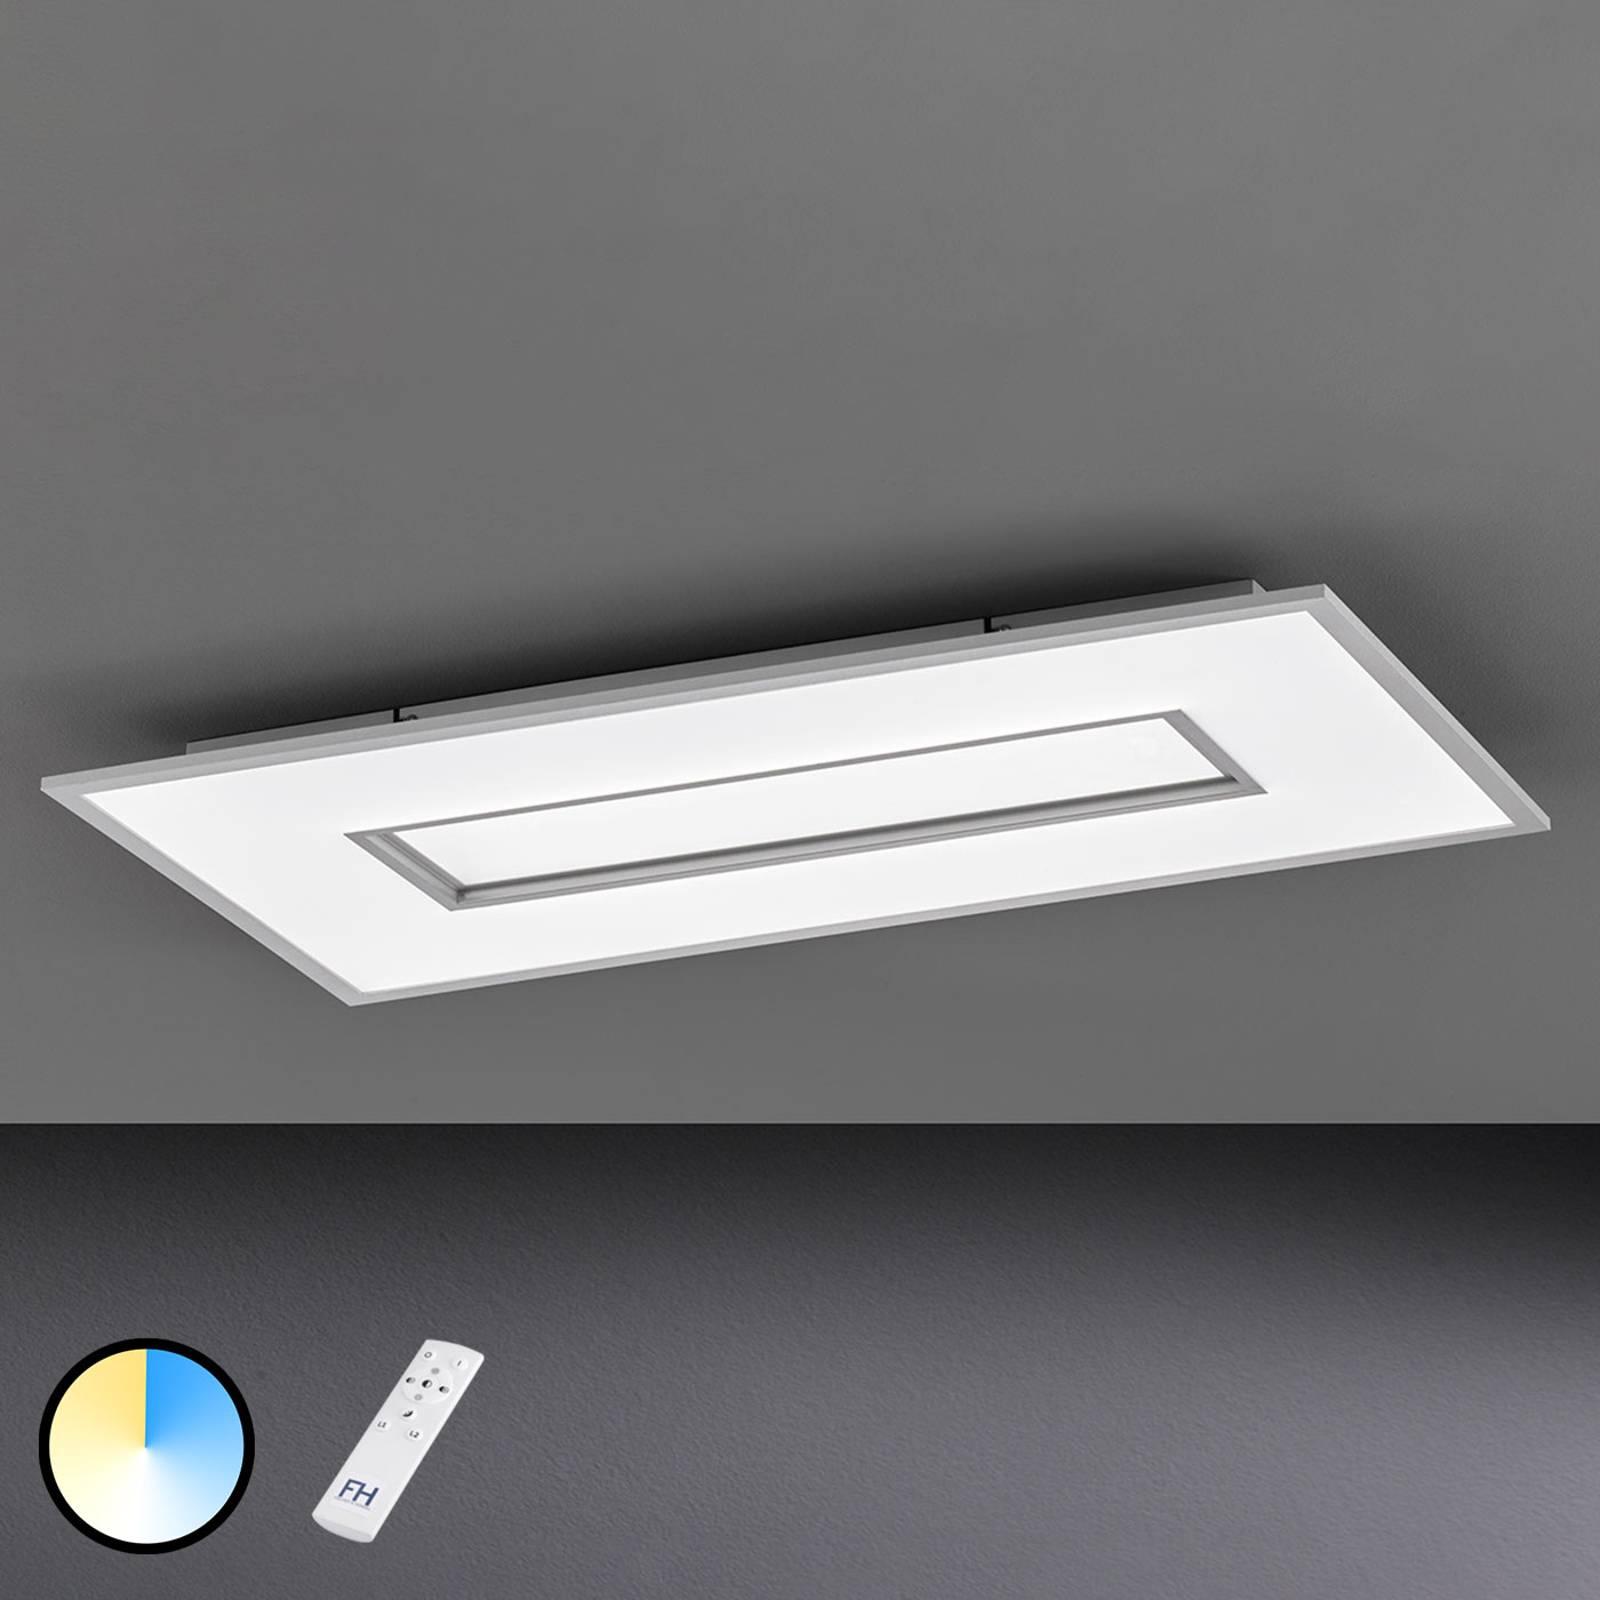 Plafoniera LED Tiara rettangolare 96x50 cm